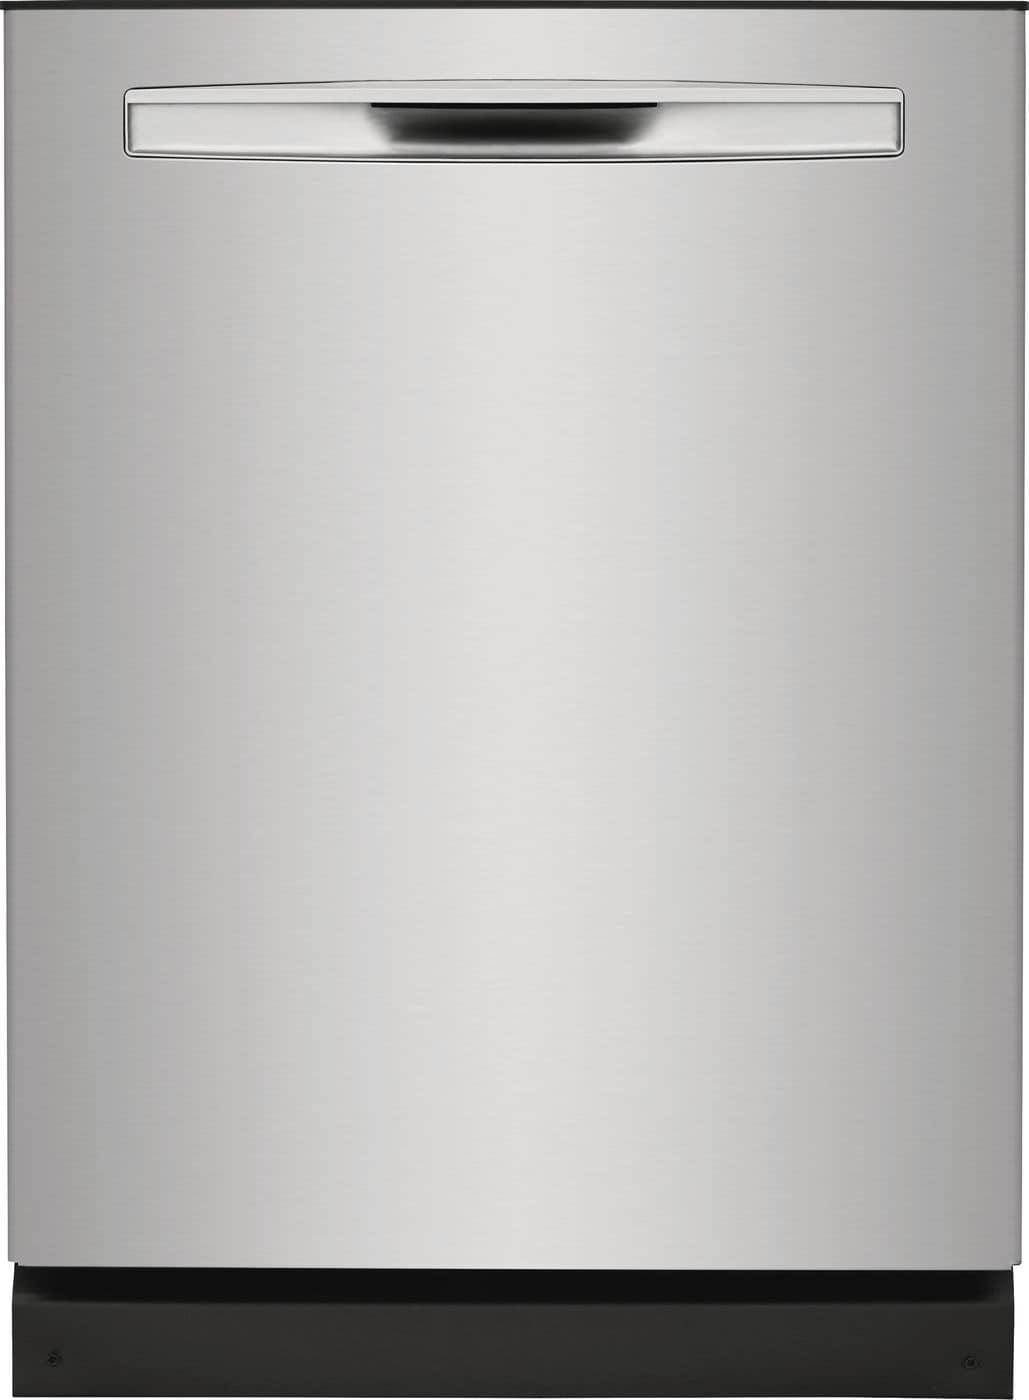 Model: FGIP2468UF | 24